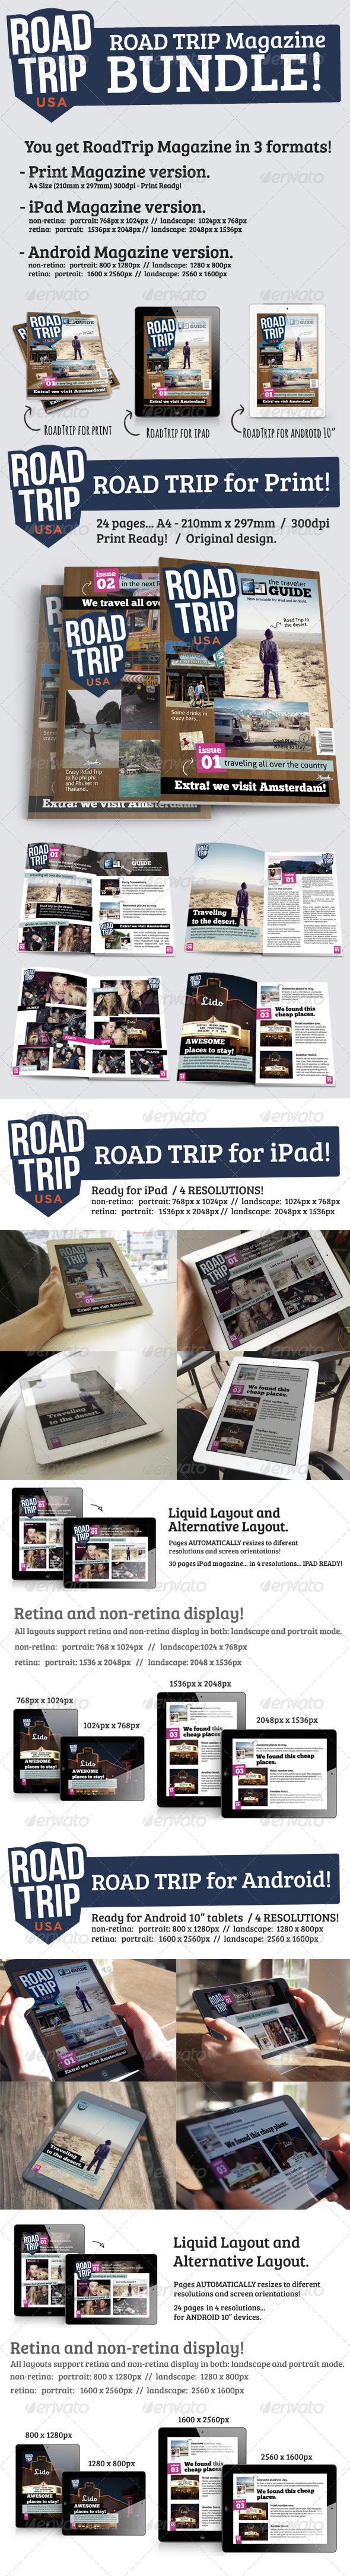 GraphicRiver RoadTrip Magazine Bundle Print & iPad & Android 5268290